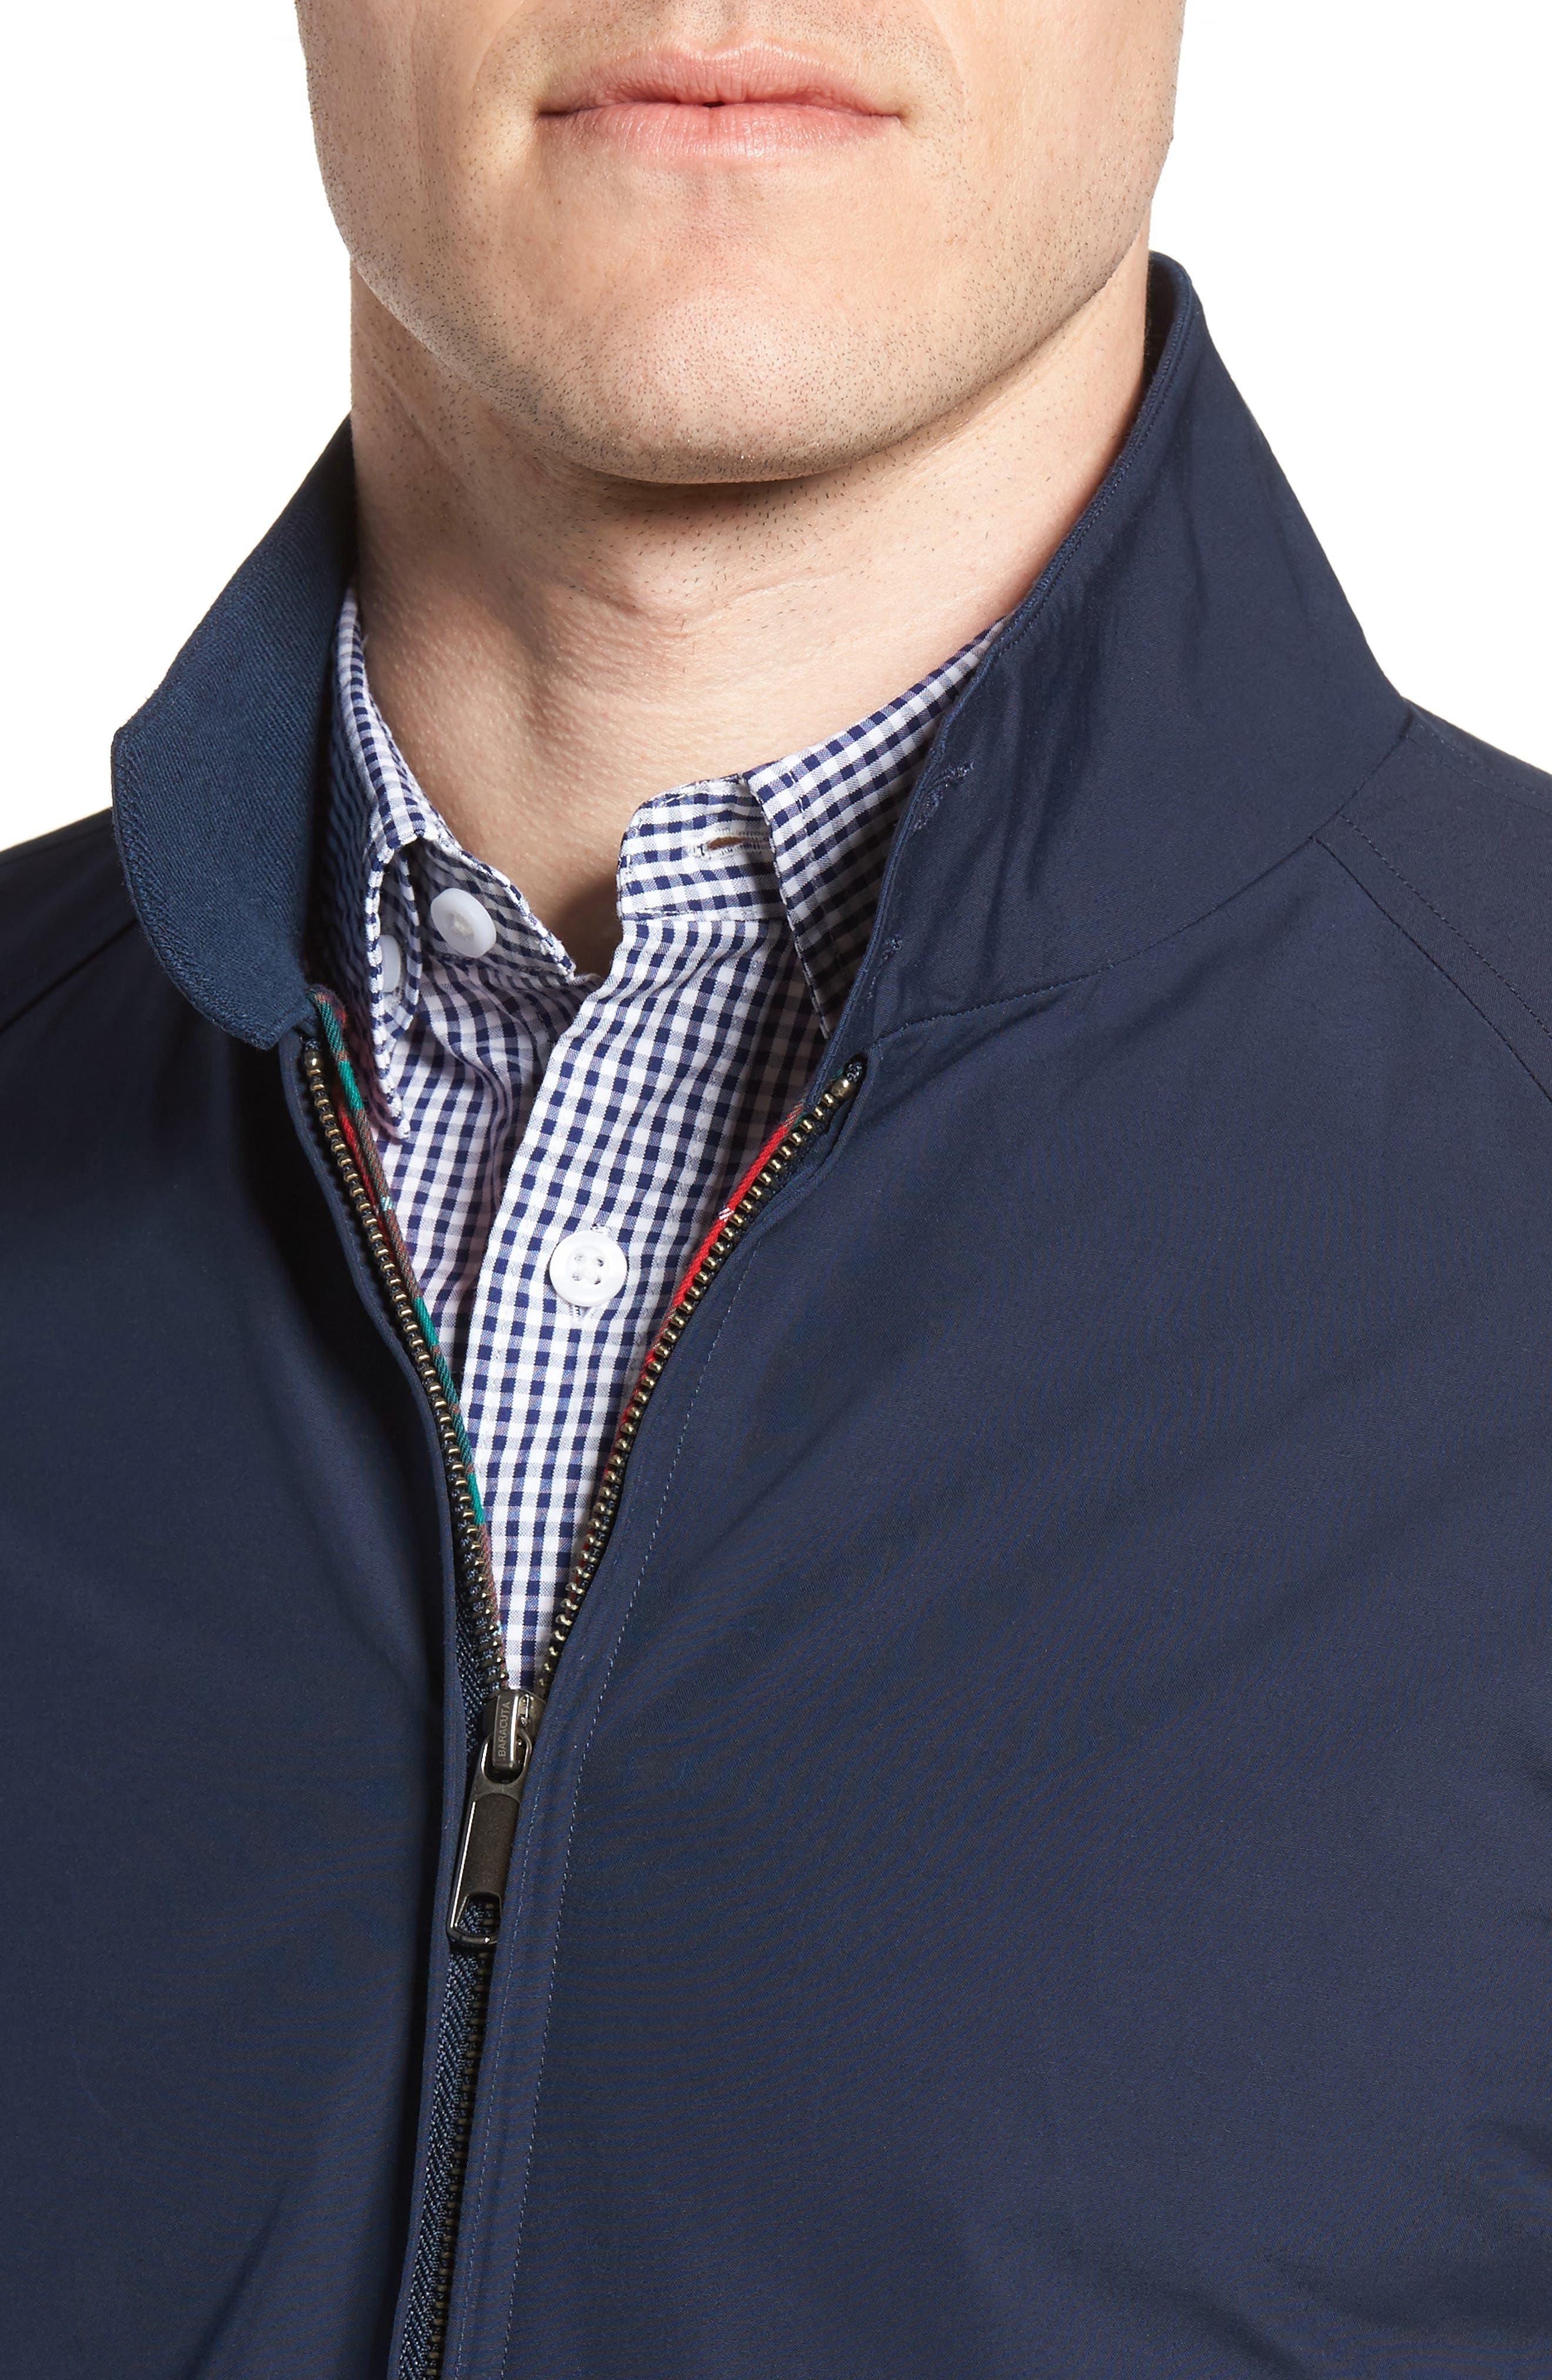 G4 Water Repellent Harrington Jacket,                             Alternate thumbnail 4, color,                             Navy